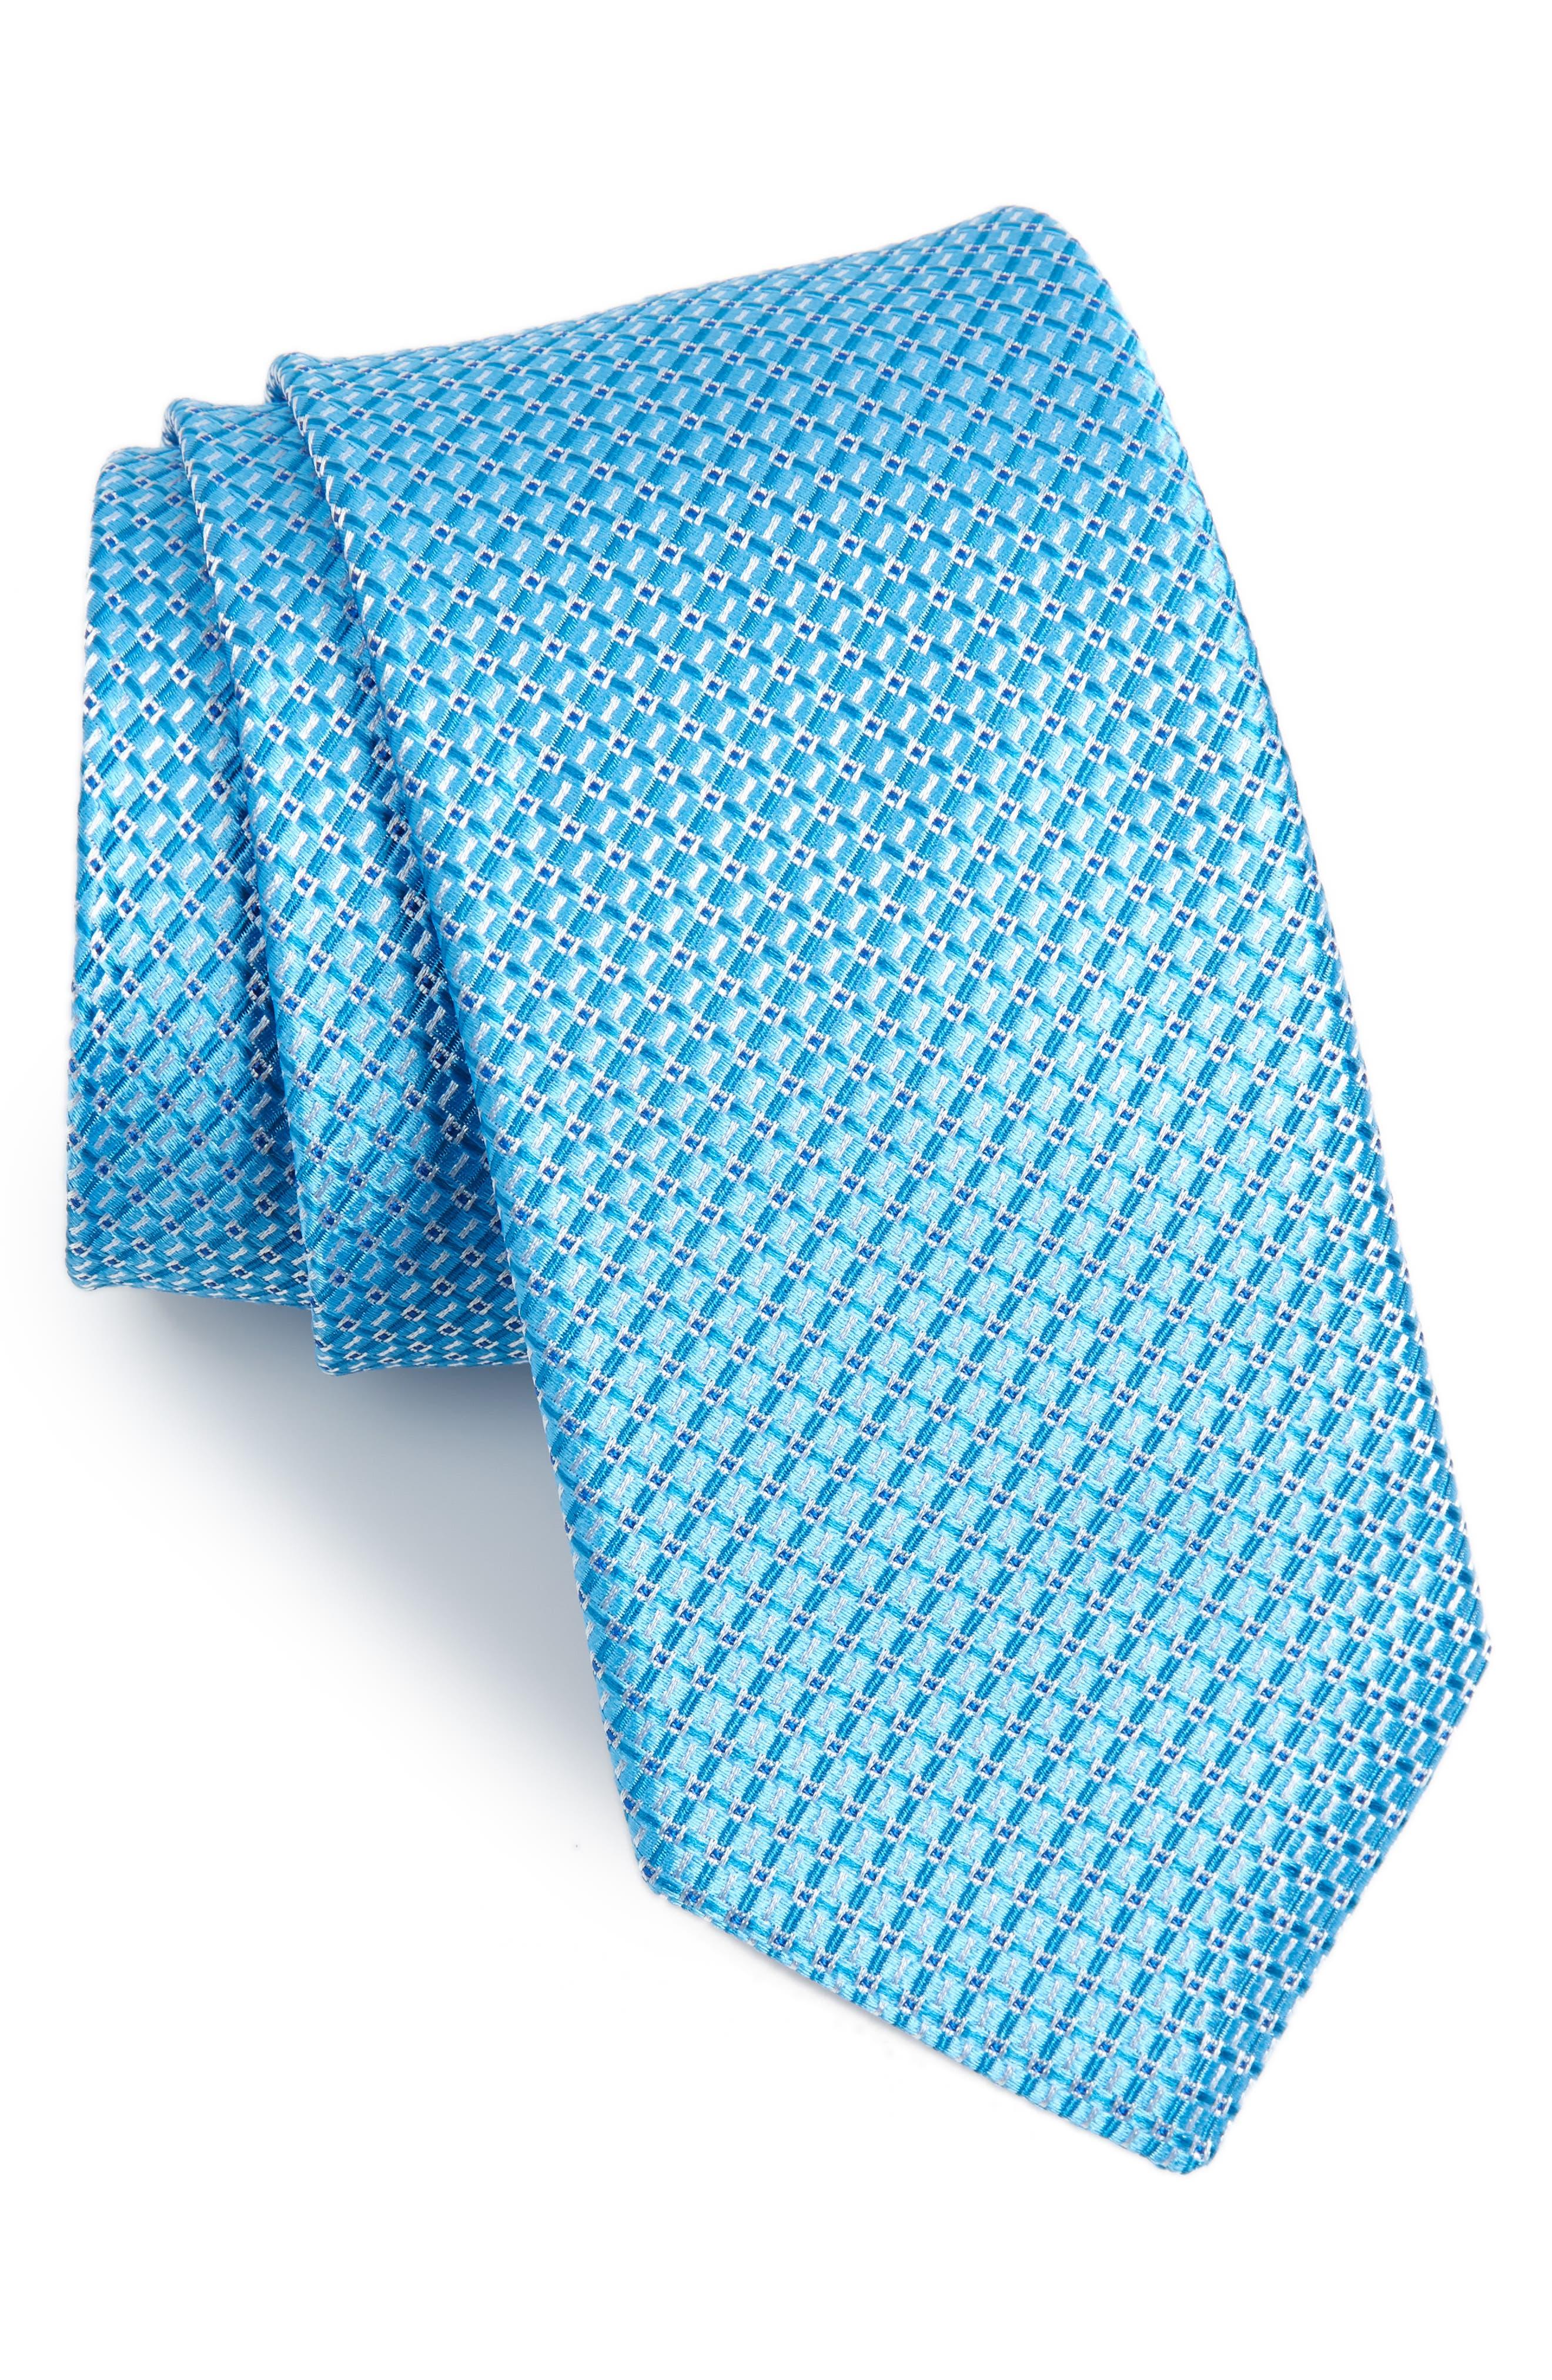 Grid Silk Tie,                             Main thumbnail 1, color,                             435